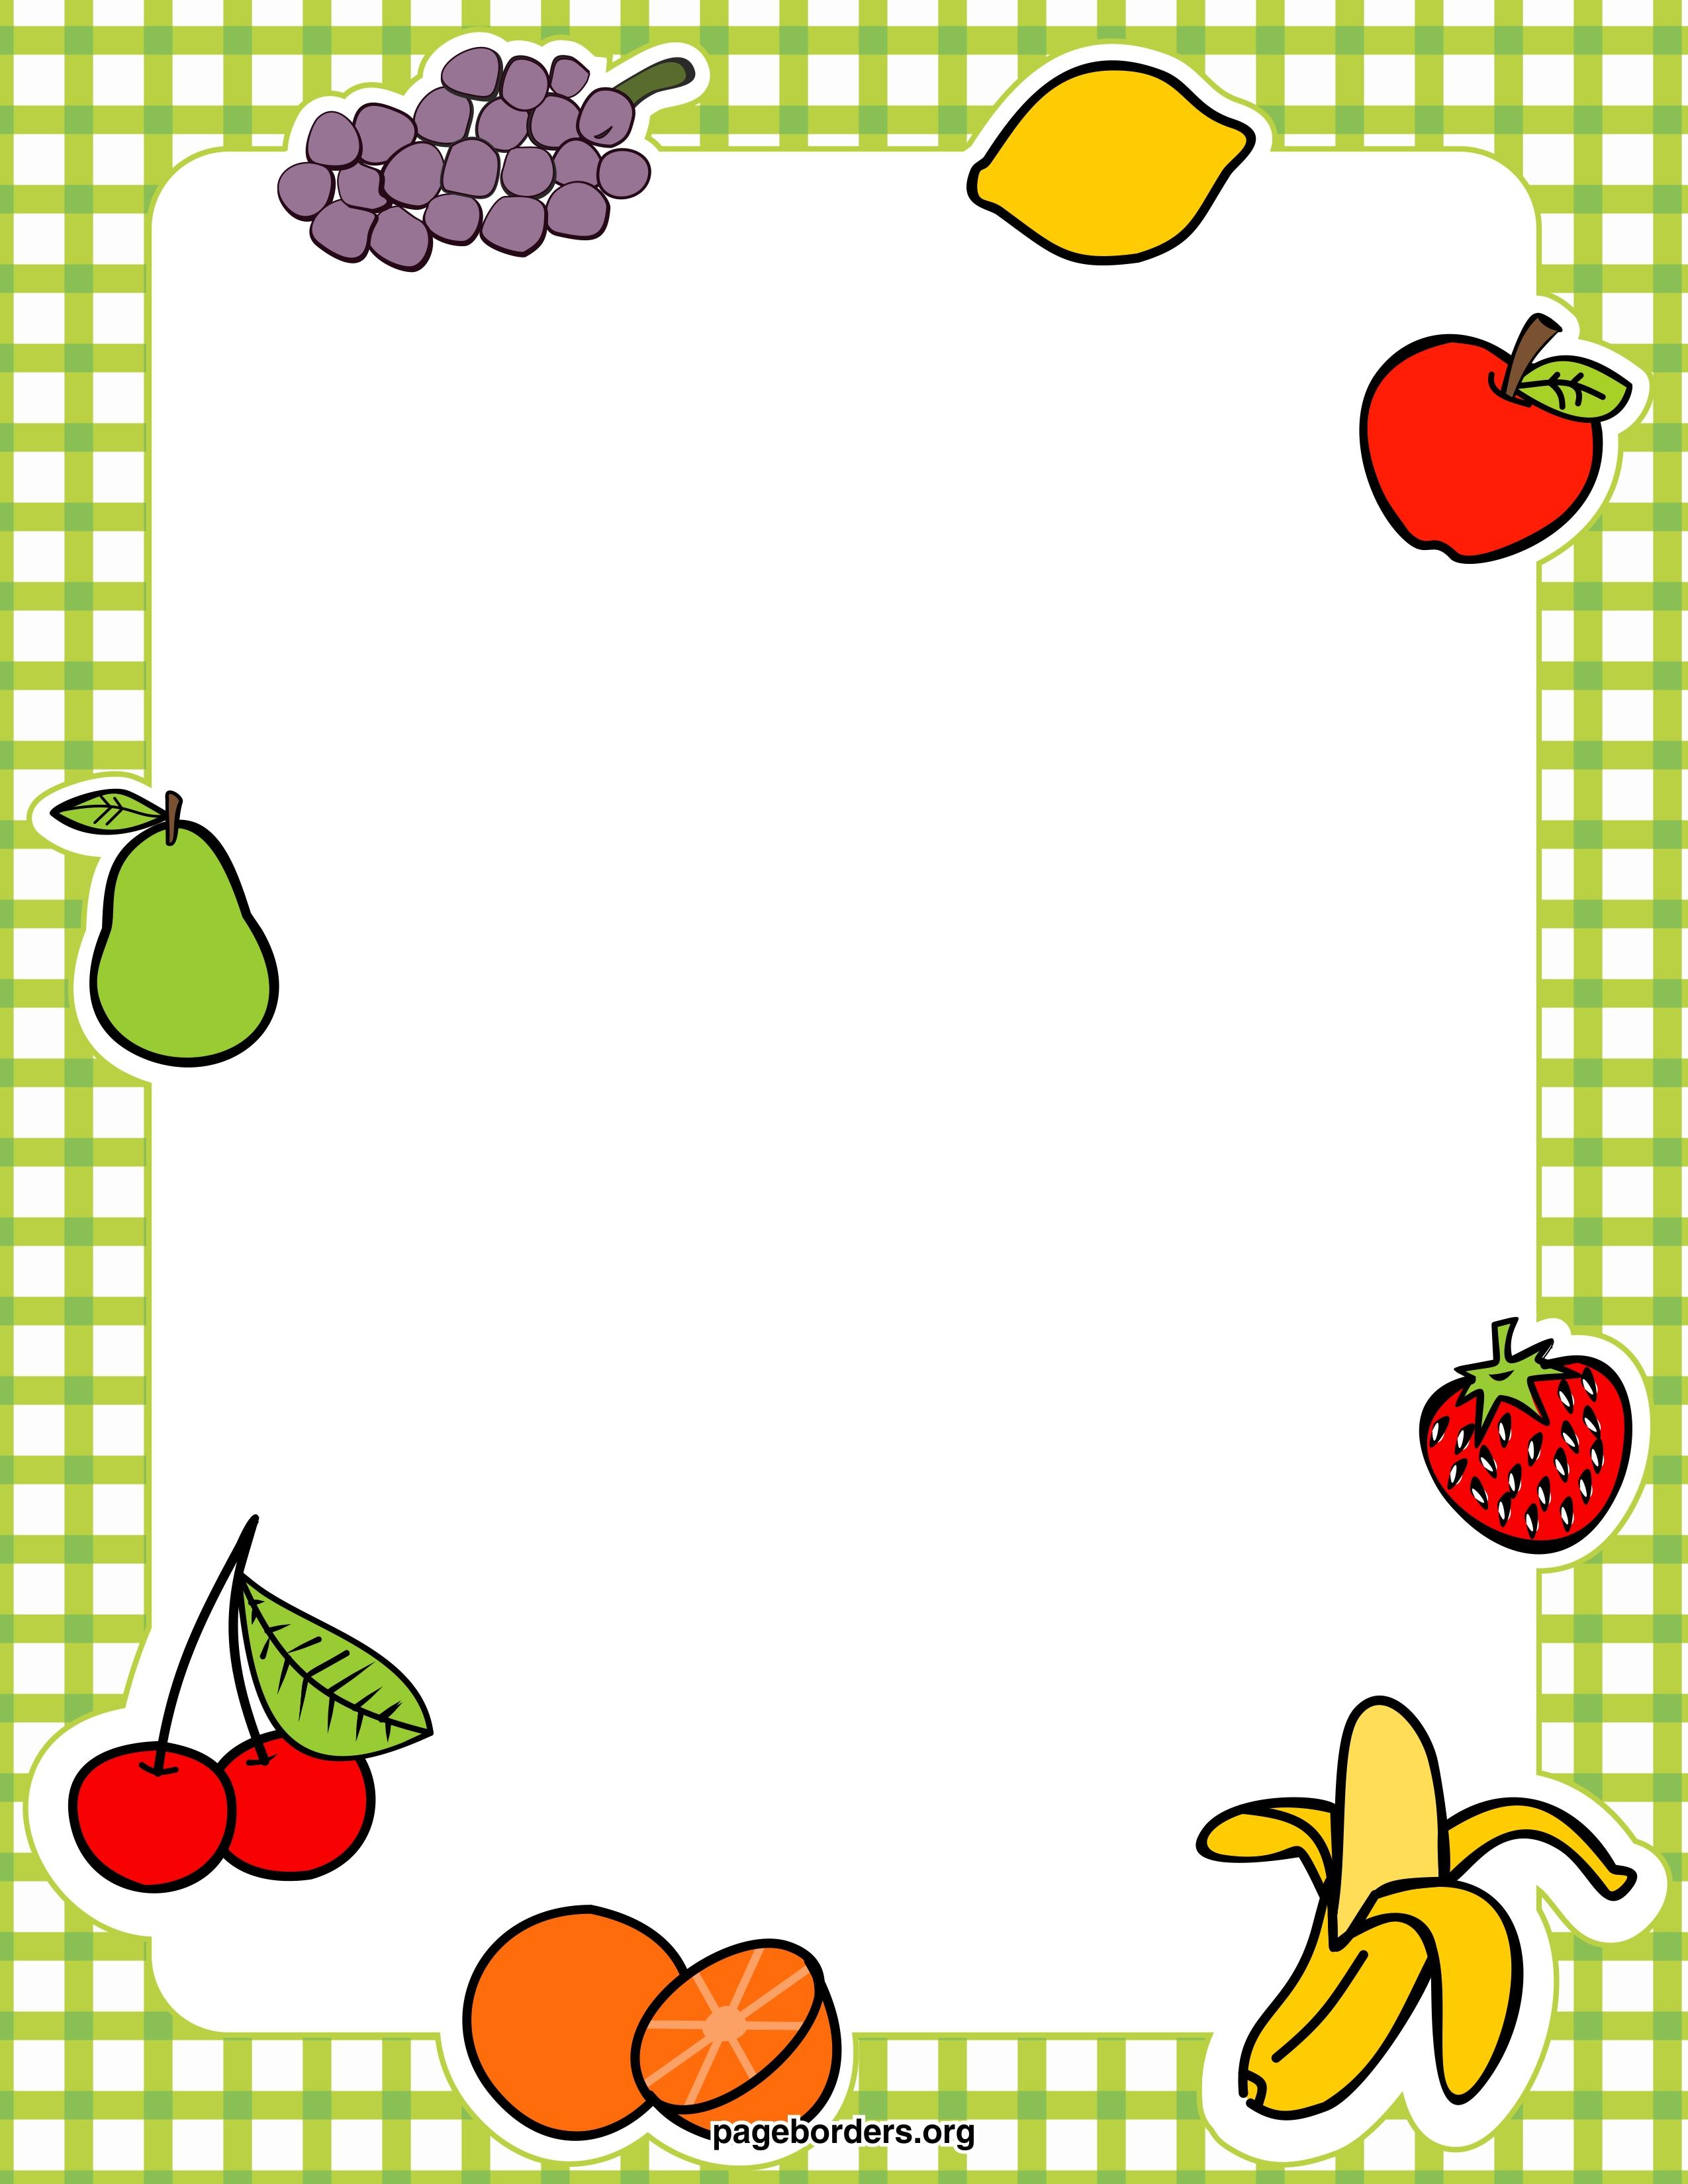 Free Border Clipart, Download Free Clip Art, Free Clip Art.